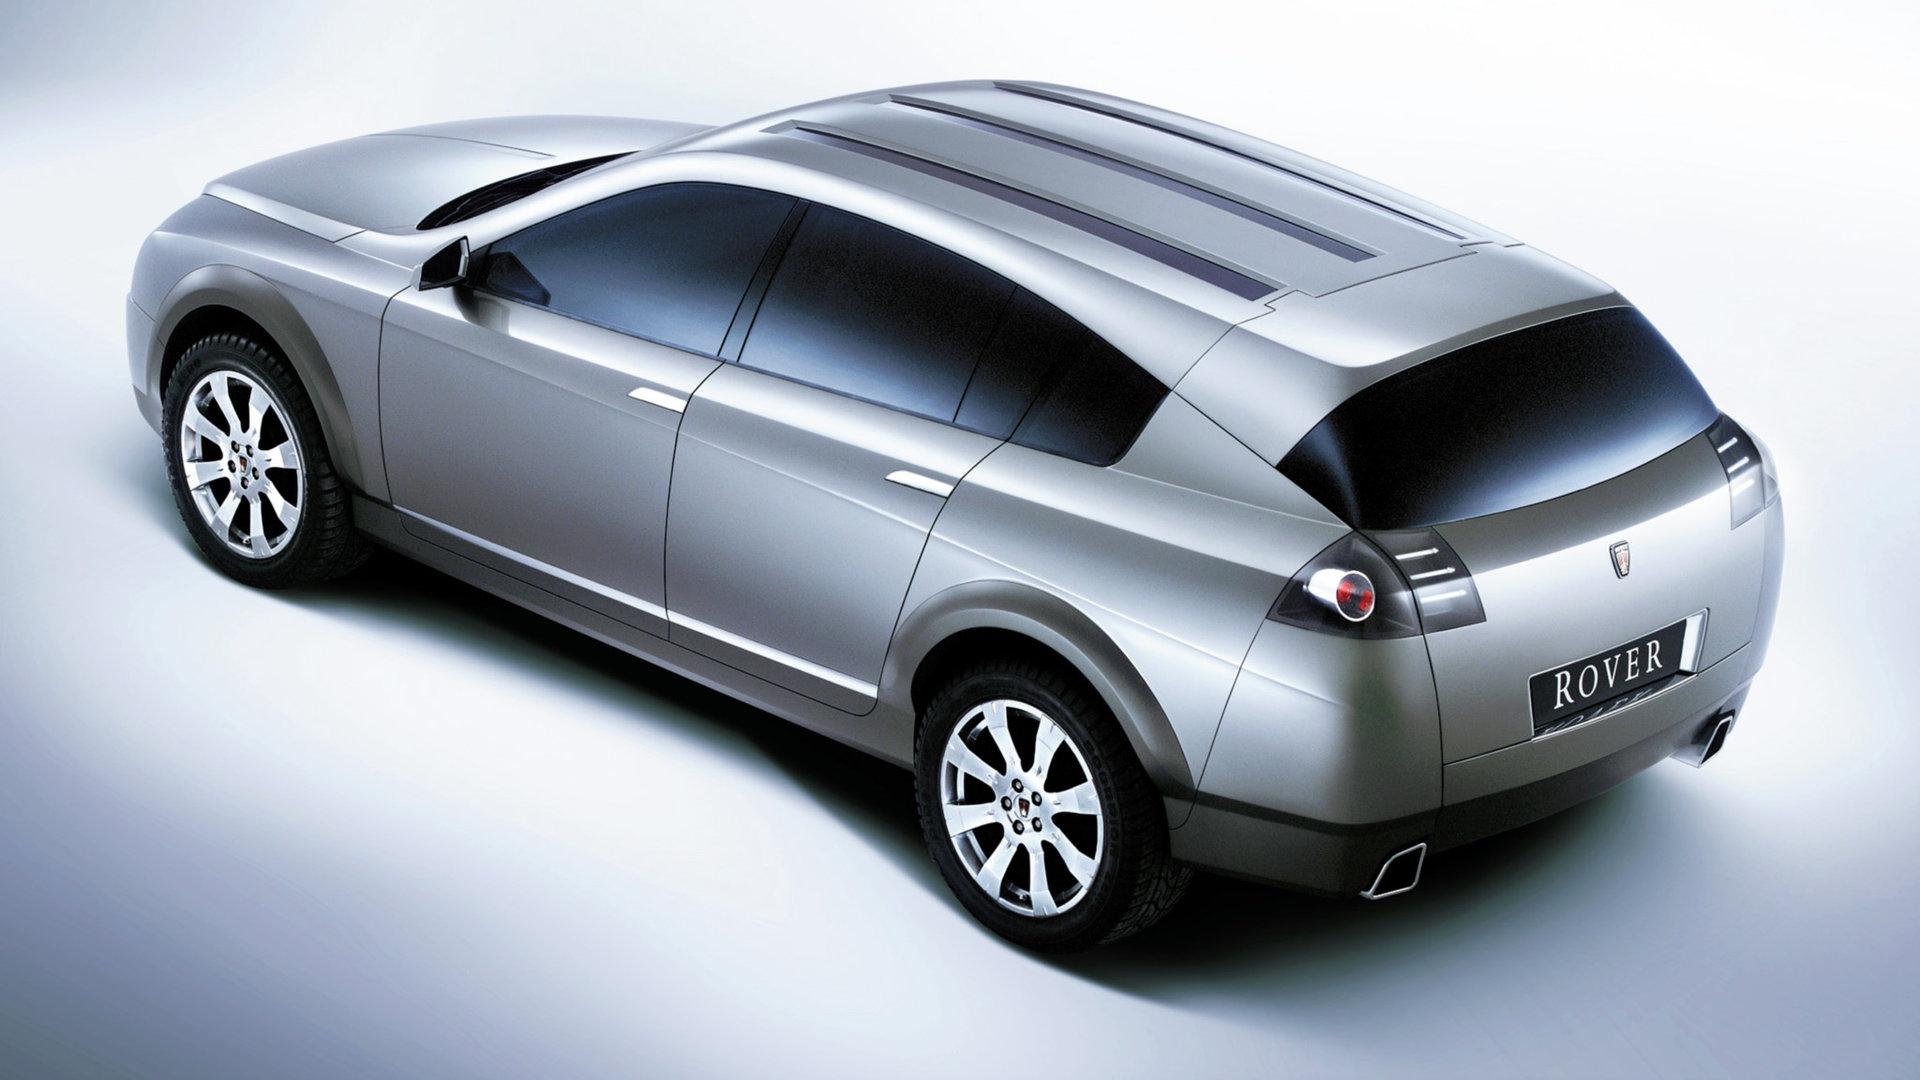 Rover TCV Concept 2